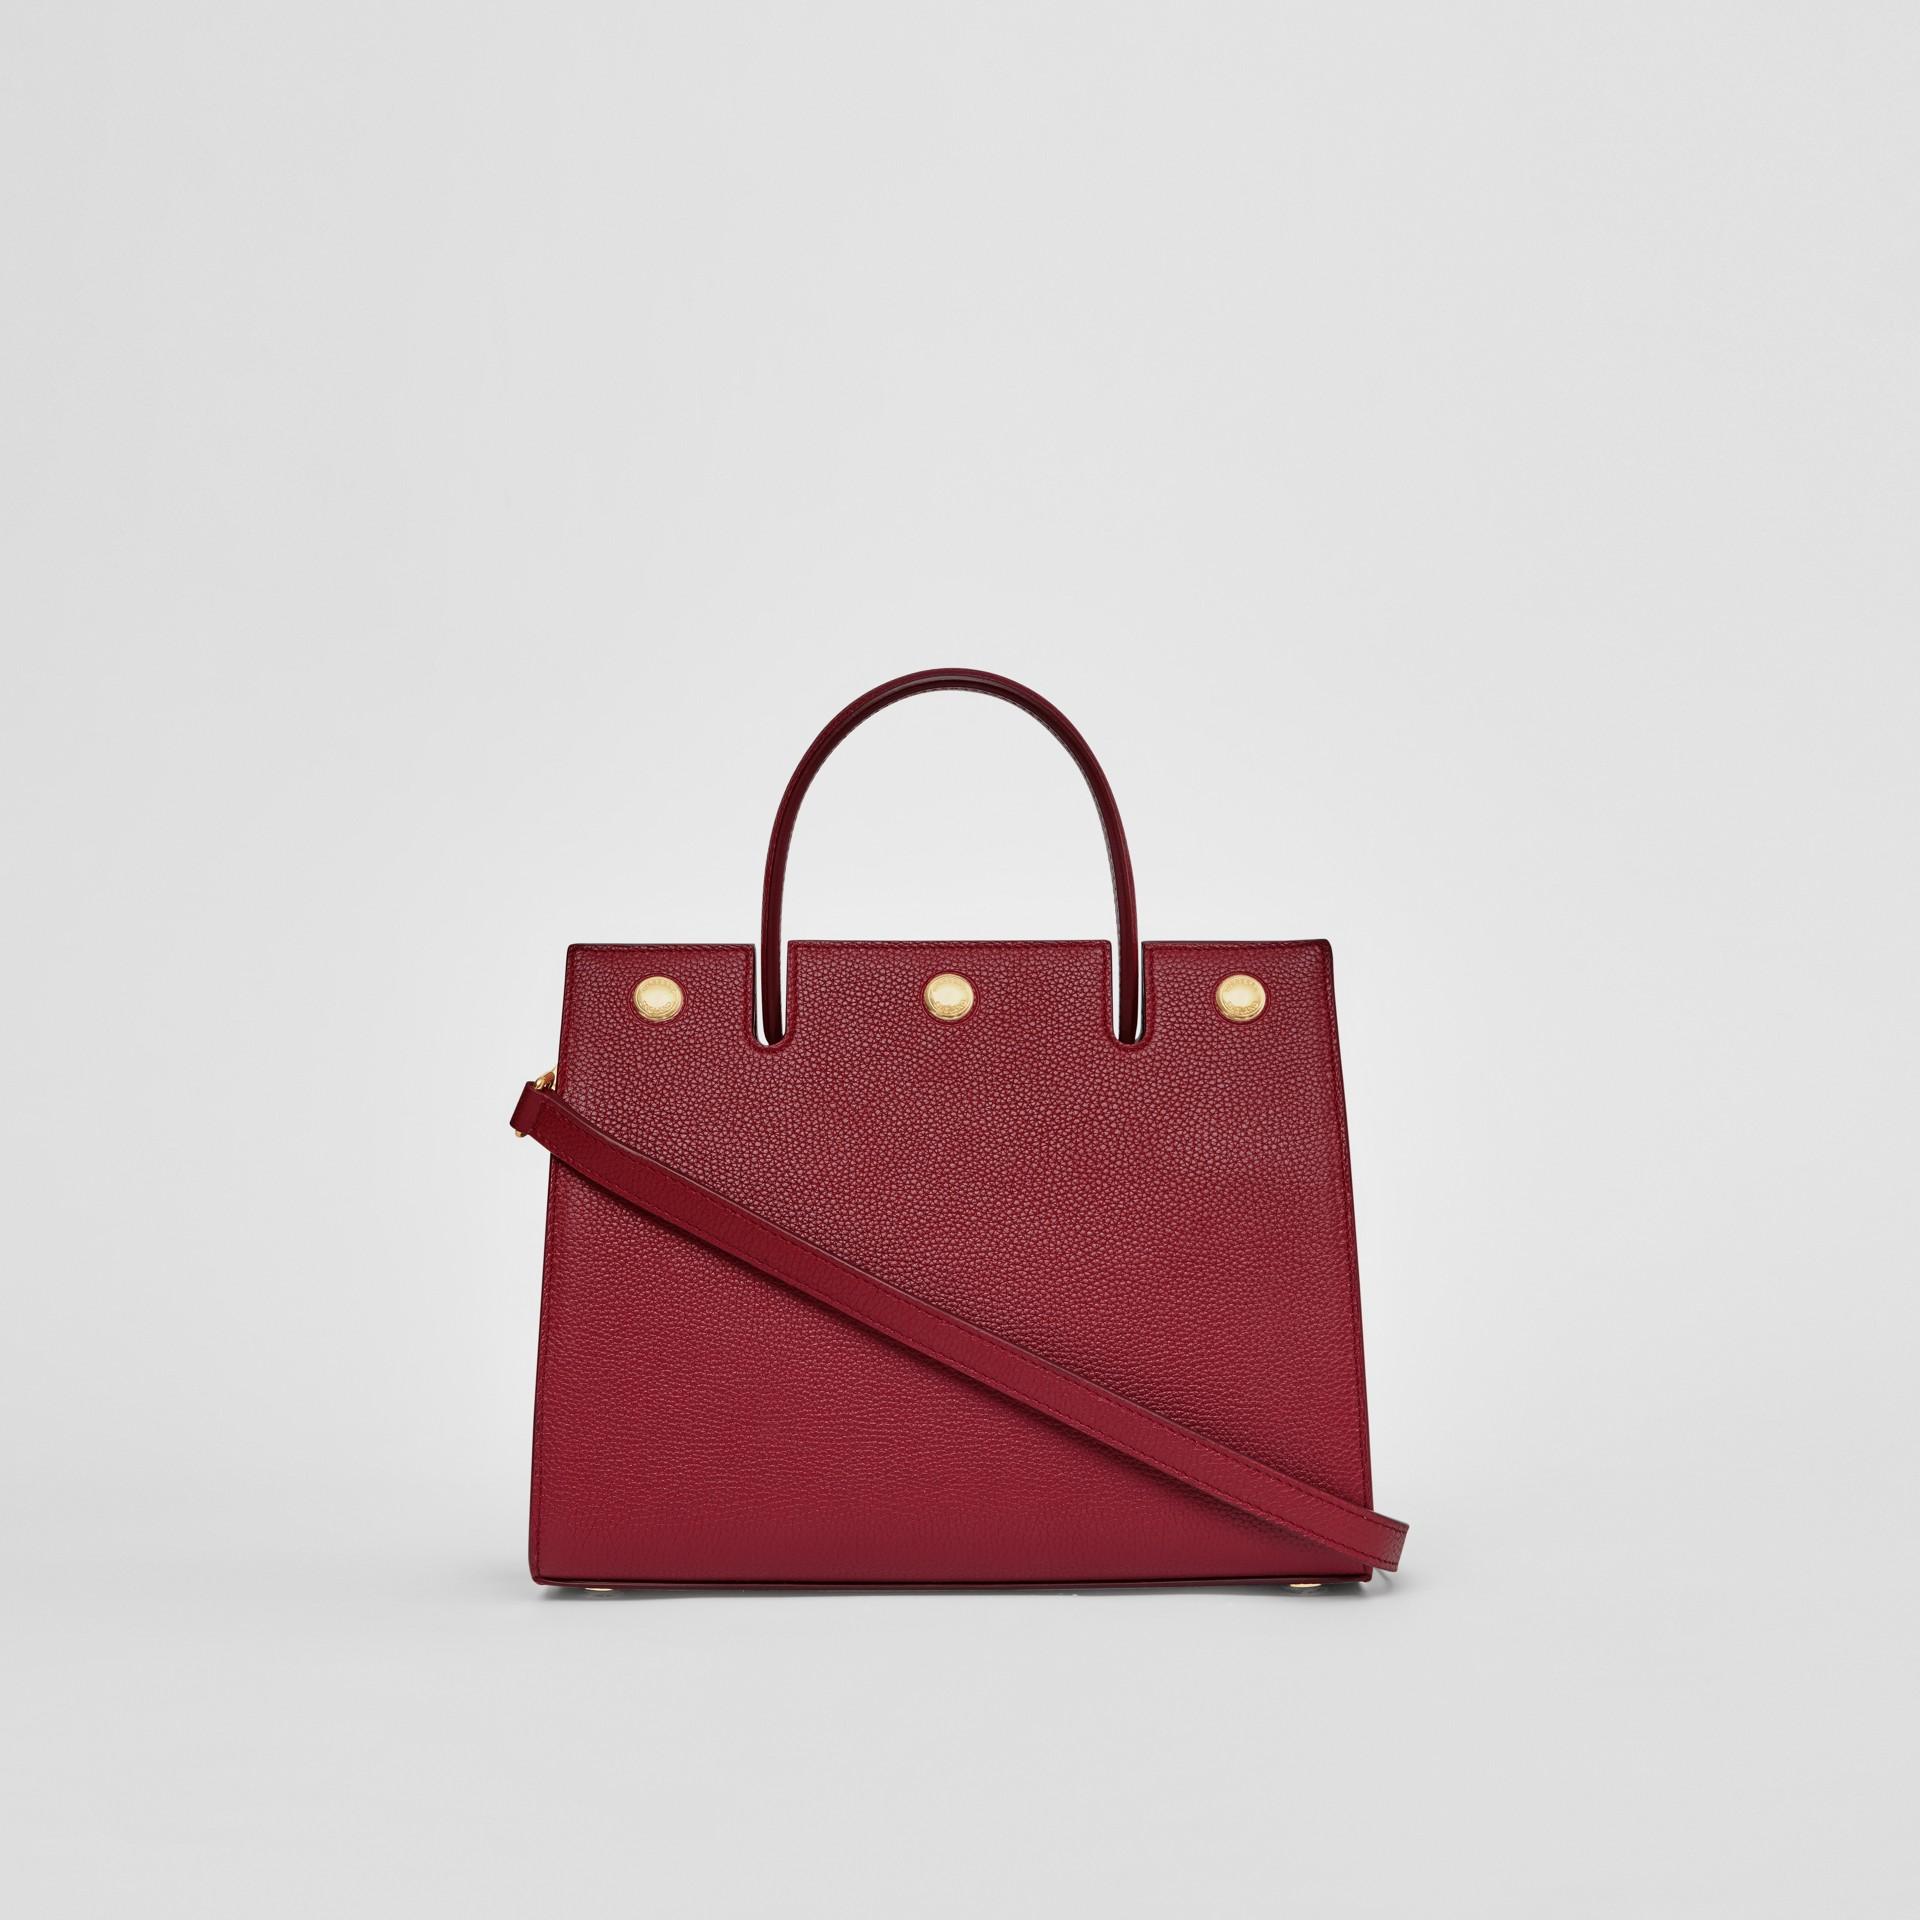 Mini Leather Title Bag in Dark Crimson - Women | Burberry United Kingdom - gallery image 7